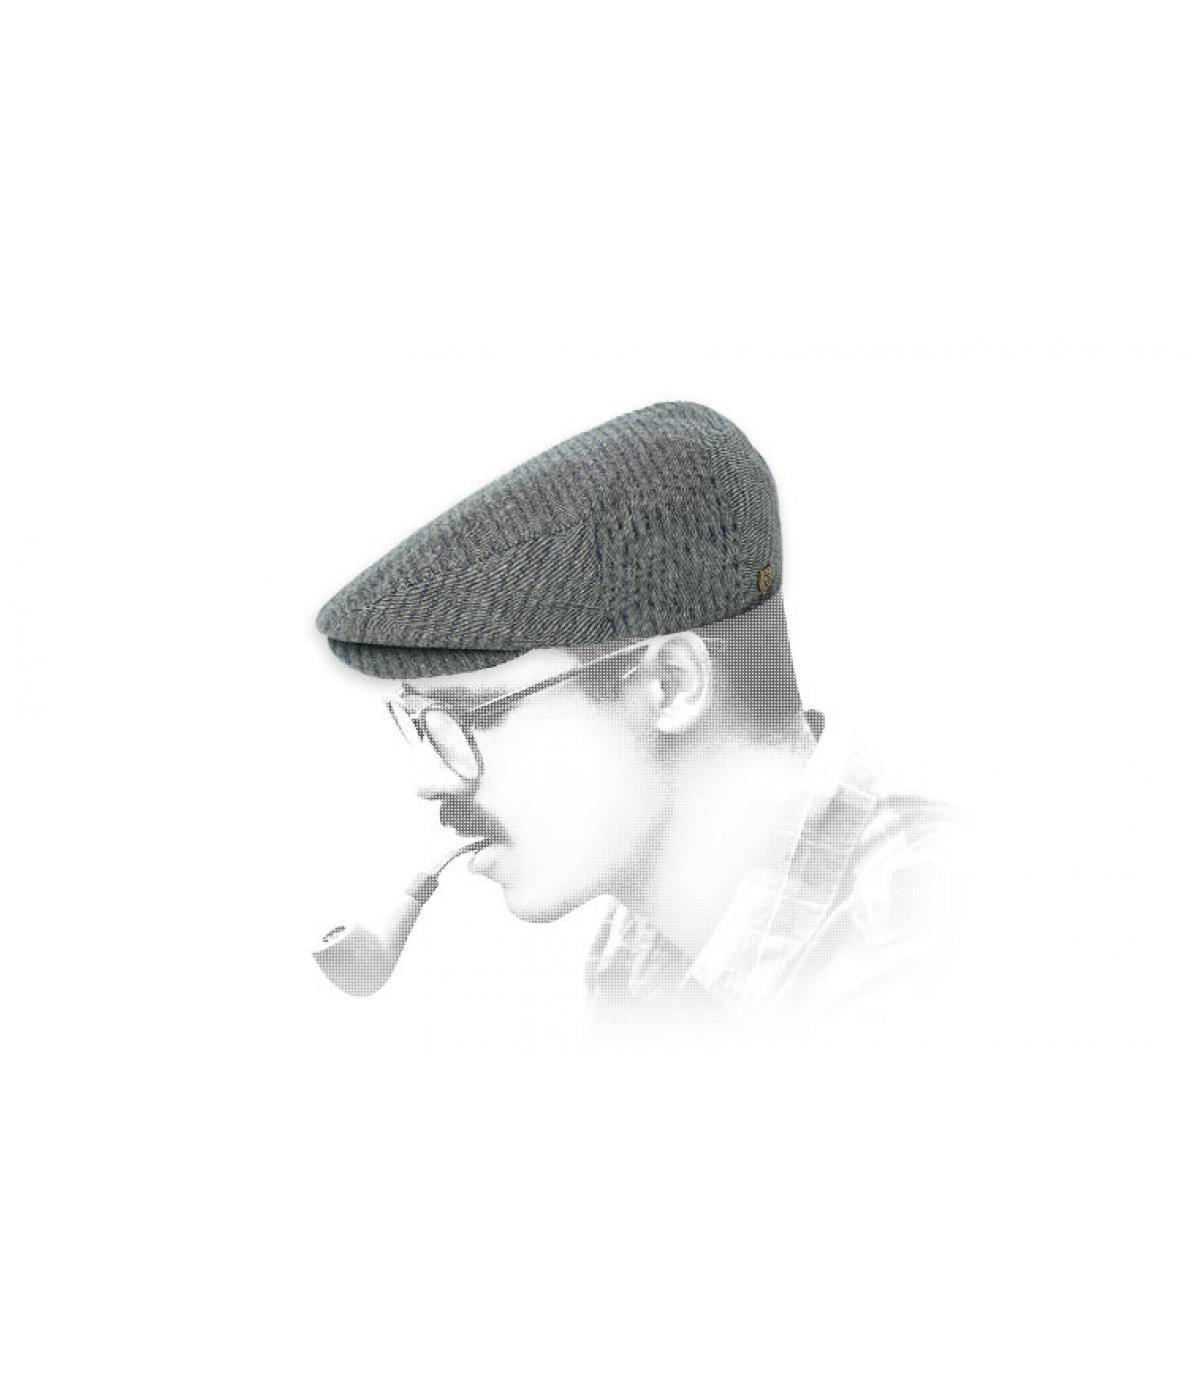 Flatcap grau Baumwolle Brixton